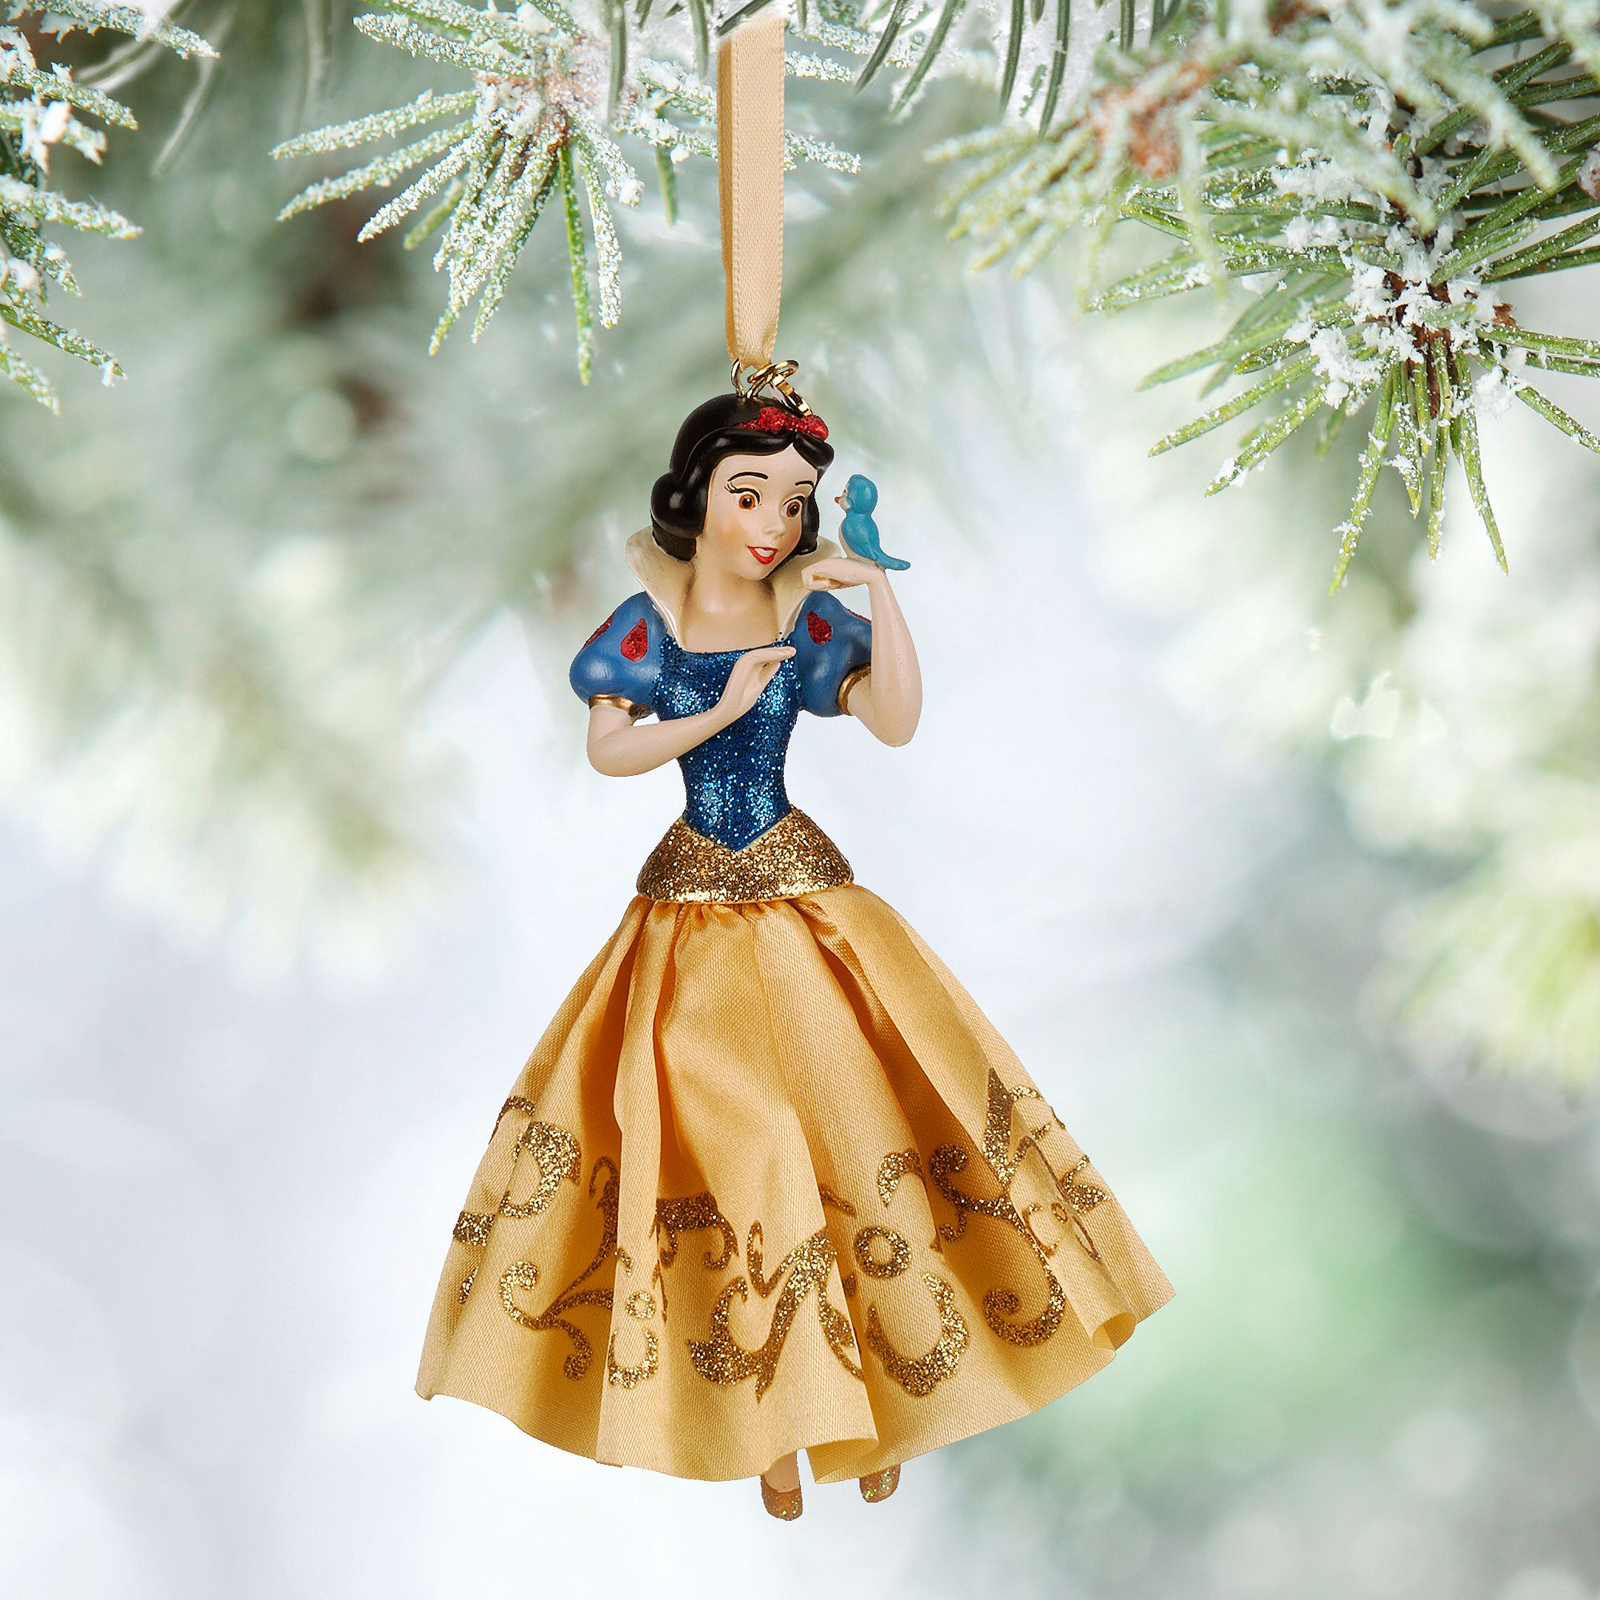 cf83cfbe5c Filmic Light - Snow White Archive  2015 Disney Store Sketchbook ...